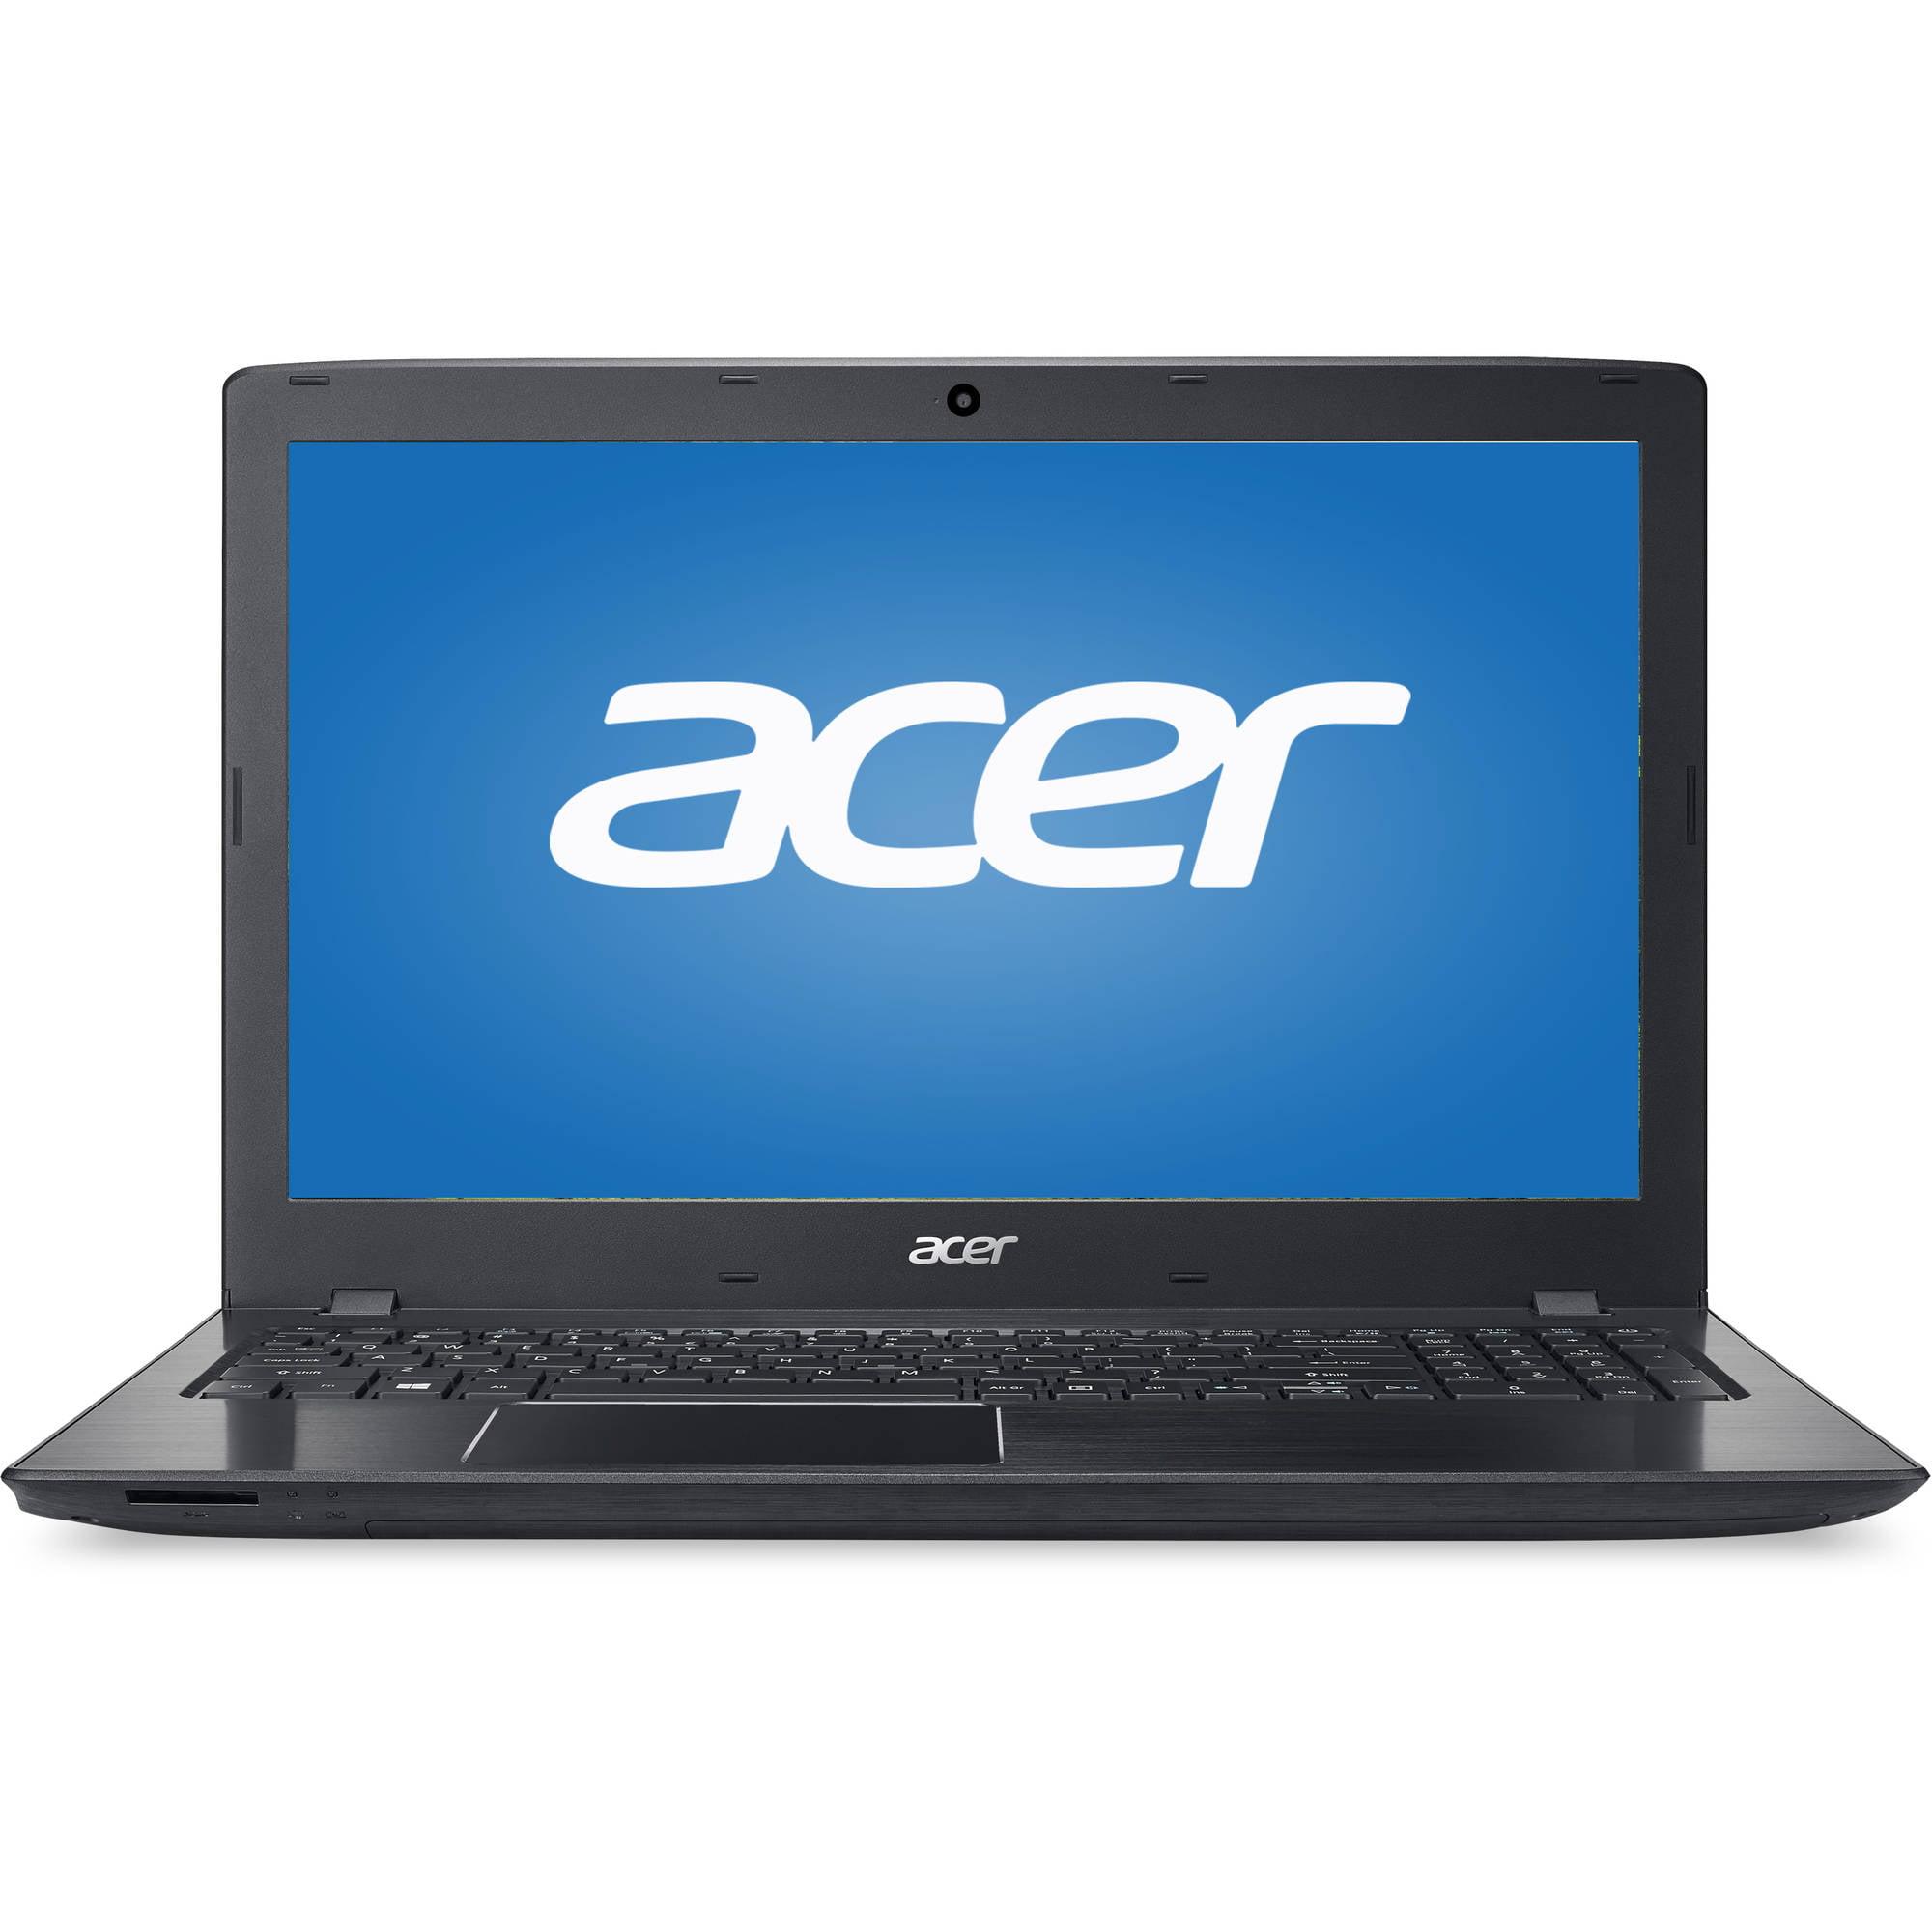 "Acer Aspire E5-575-54E8 15.6"" Laptop, Windows 10 Home, Intel Core i5-6200U Dual-Core Processor, 6GB Memory, 1TB Hard Drive"